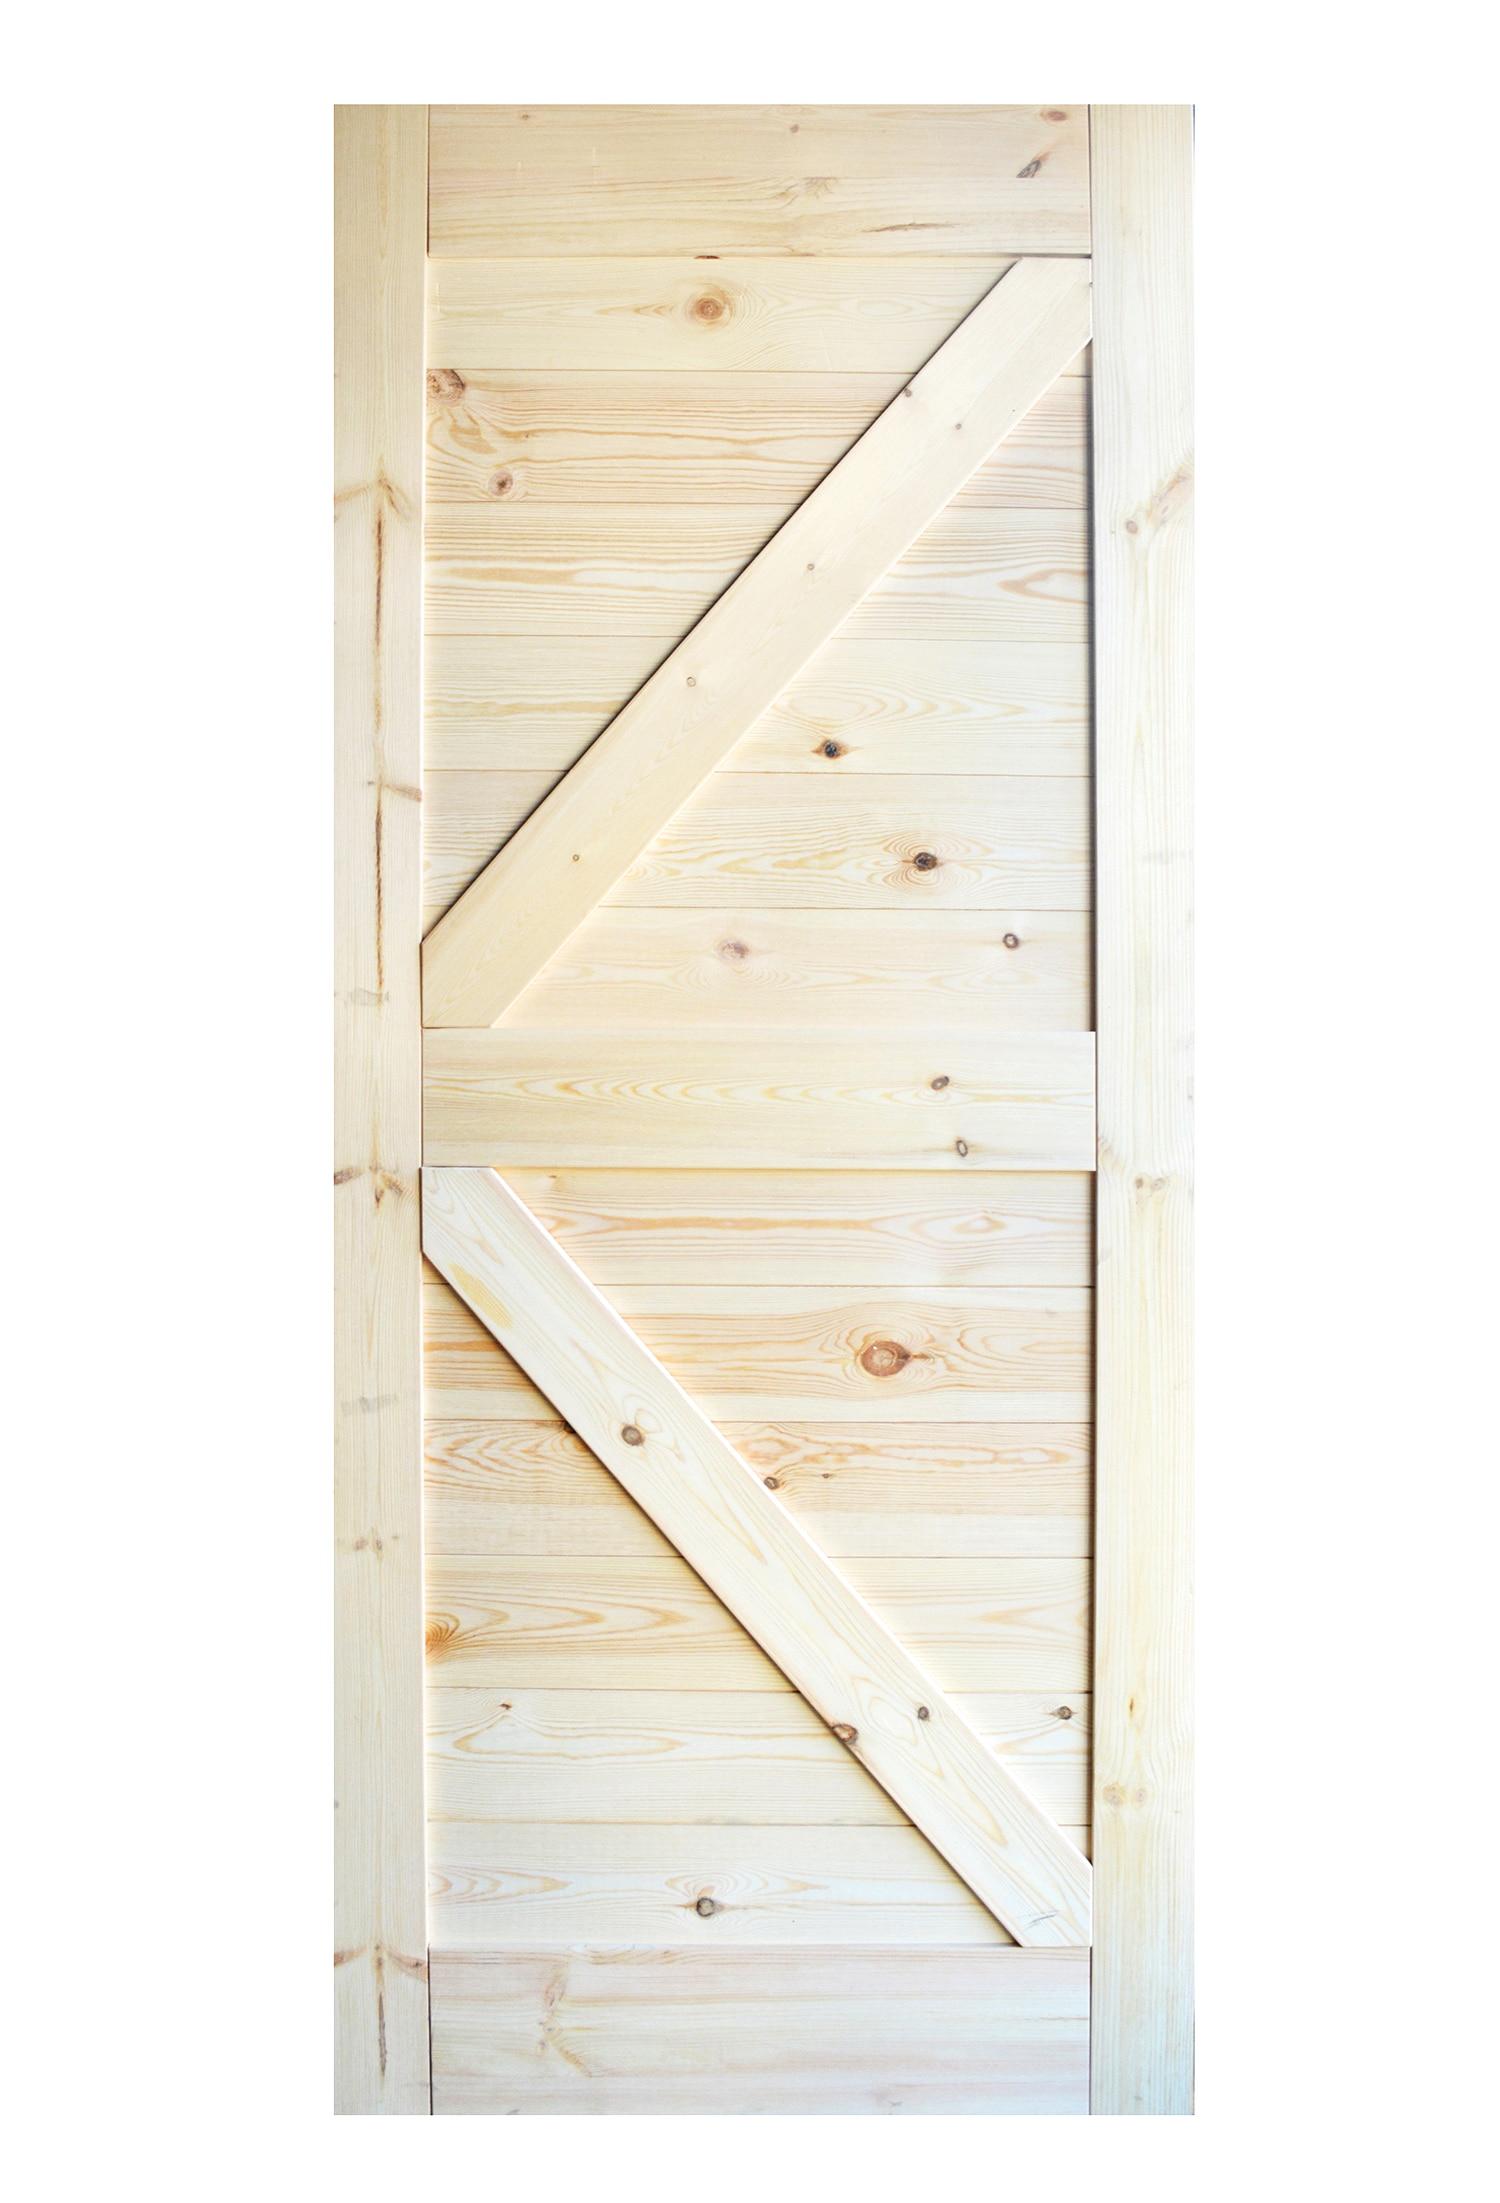 DIYHD 36inX84in Pine Knotty Sliding Barn Wood Door Slab Two-Side Horizontal Arrow Shape Barn Door Slab (Disassembled Unfinished)